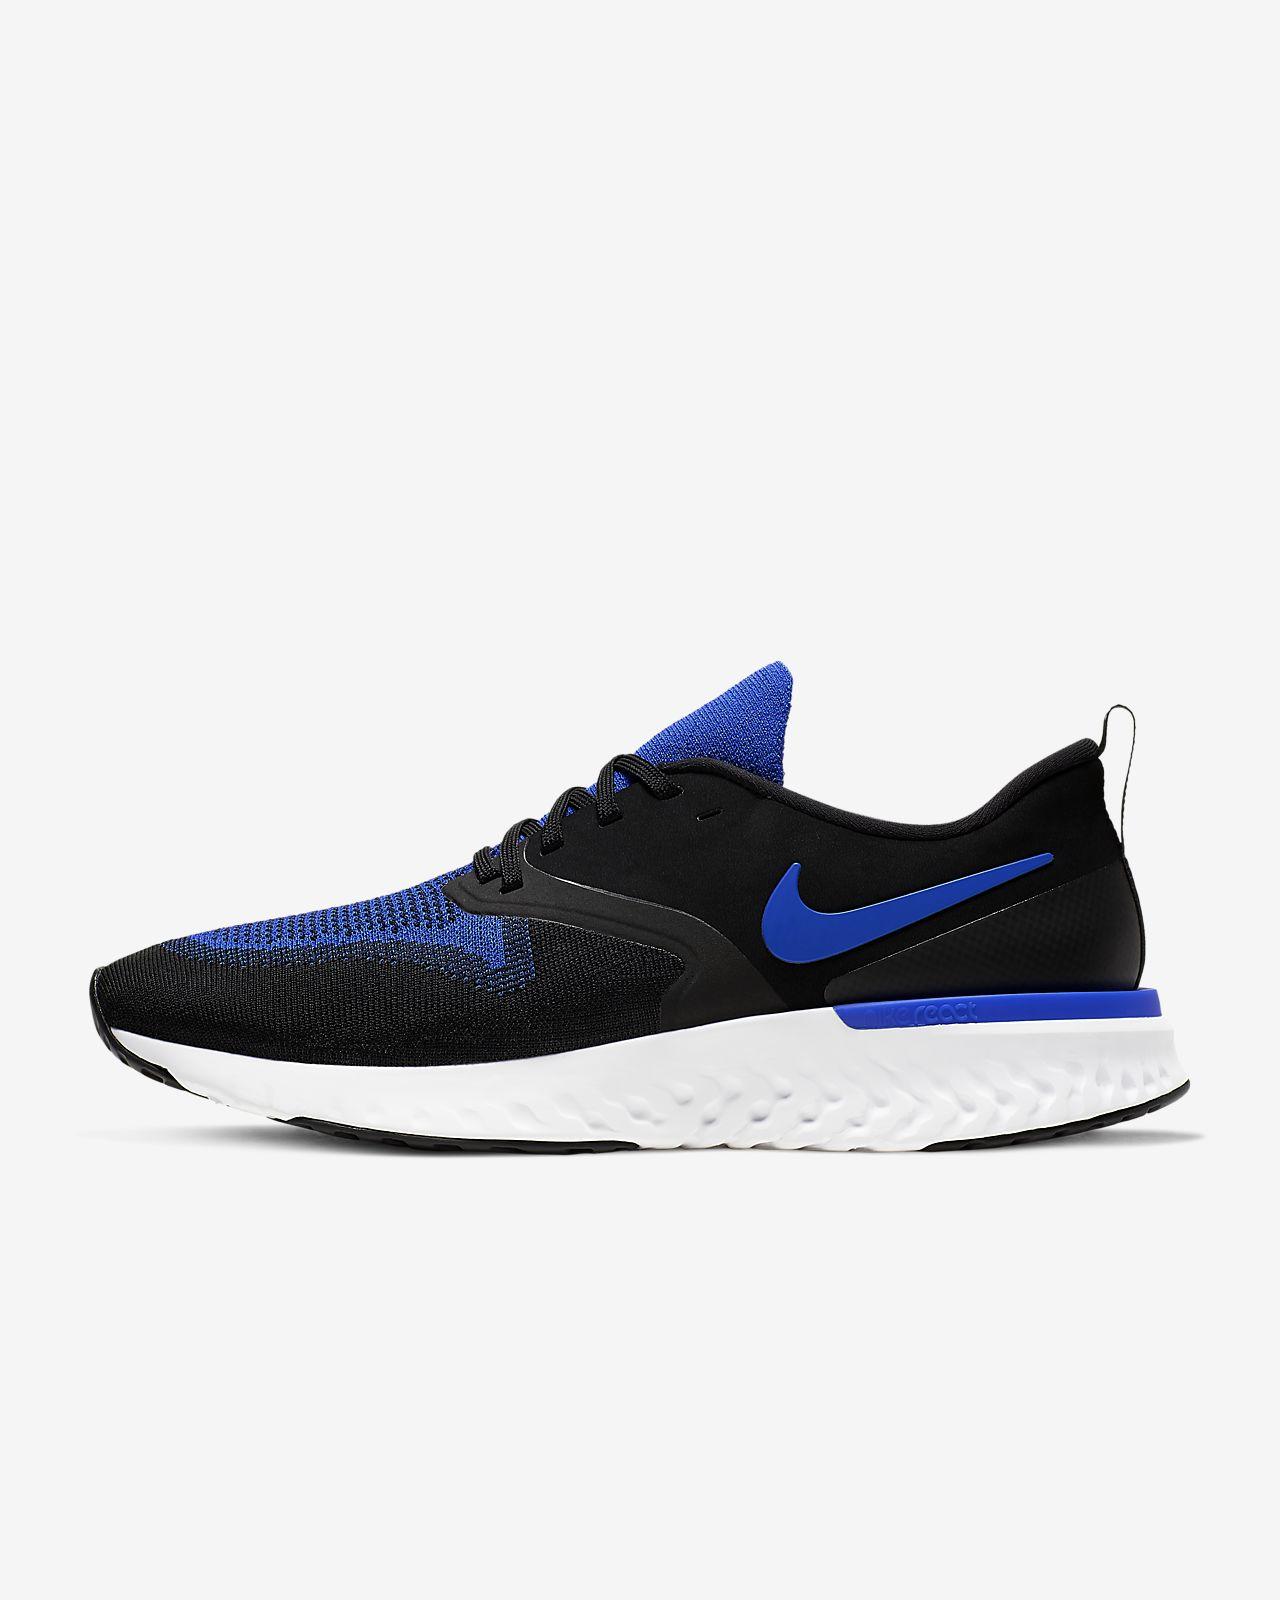 Nike Odyssey React Flyknit 2 男款跑鞋